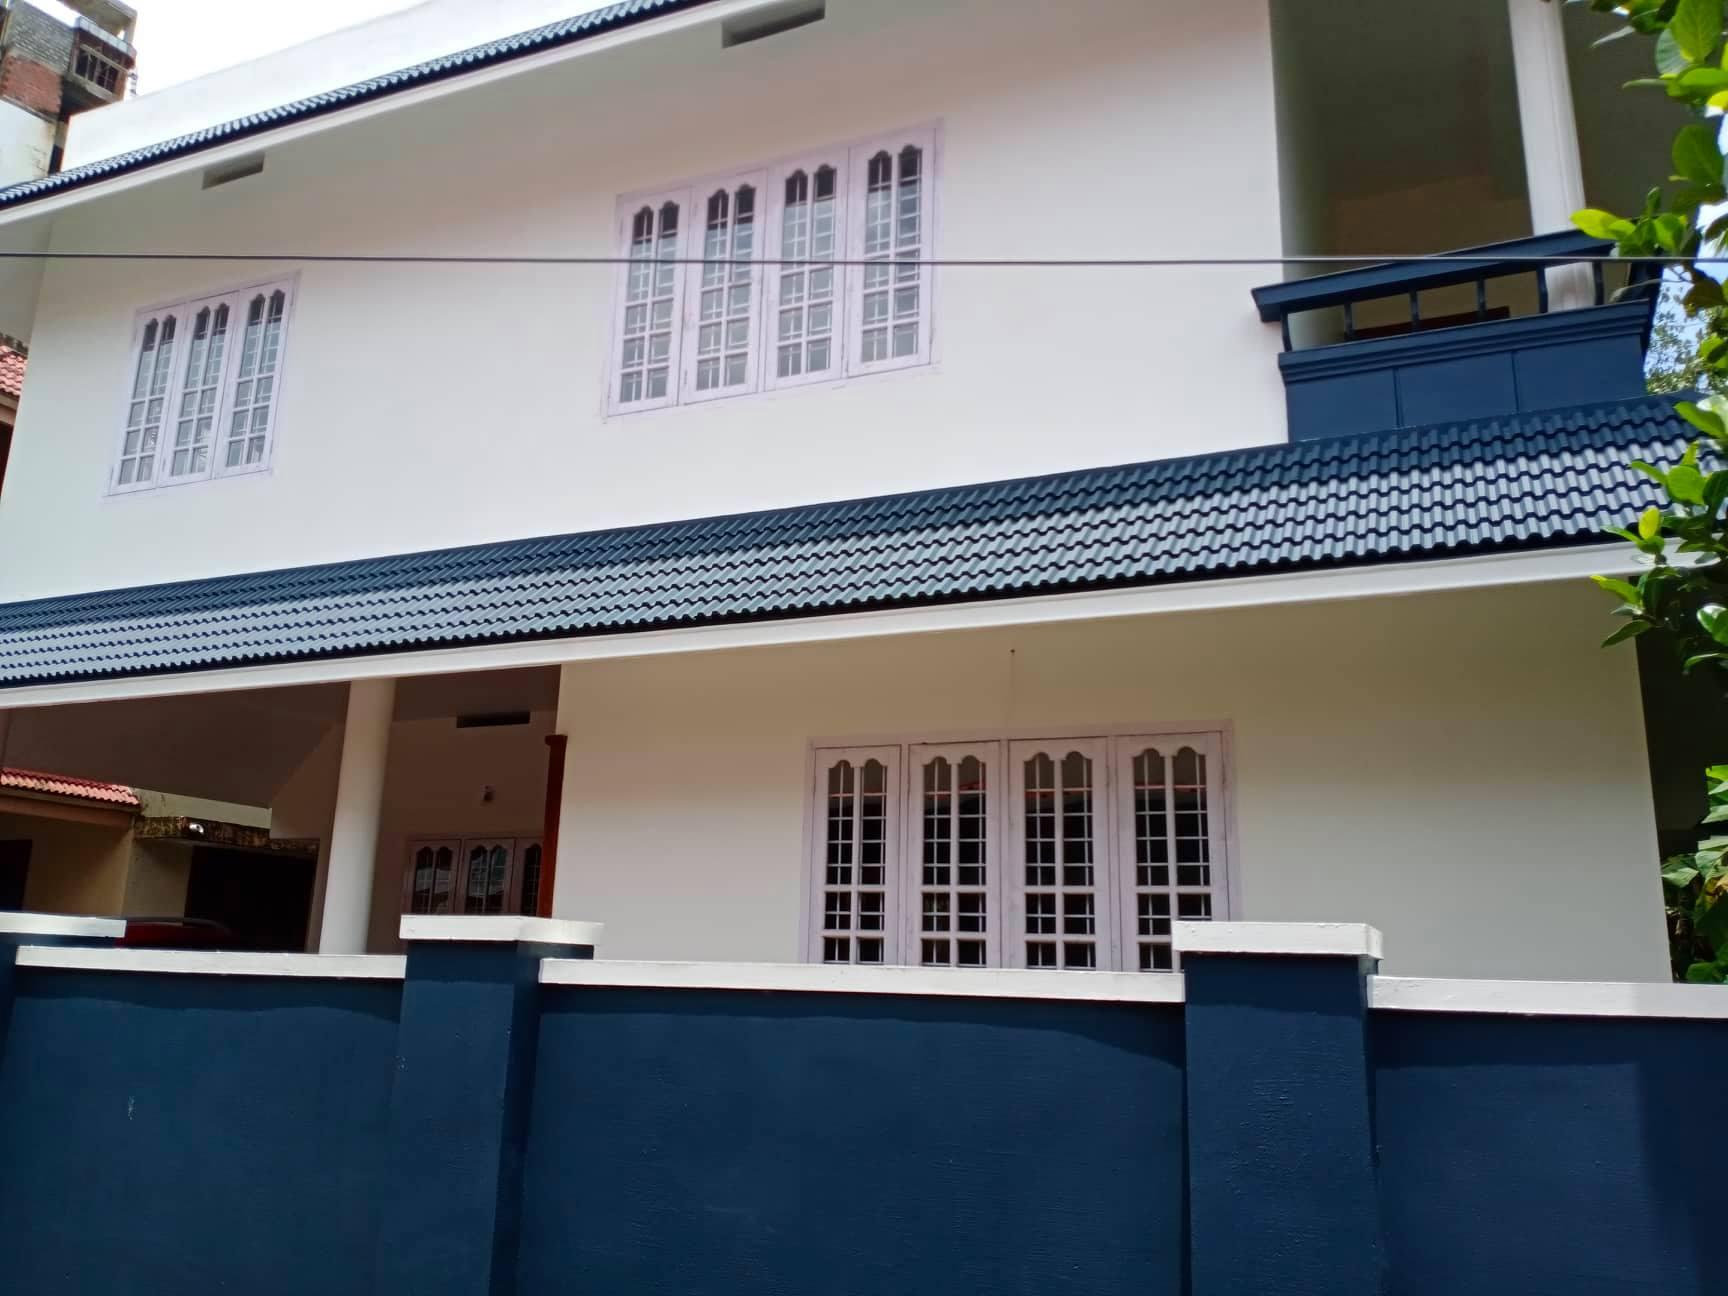 4 BEDROOM HOUSE FOR SALE @ VENNALA, KOCHI